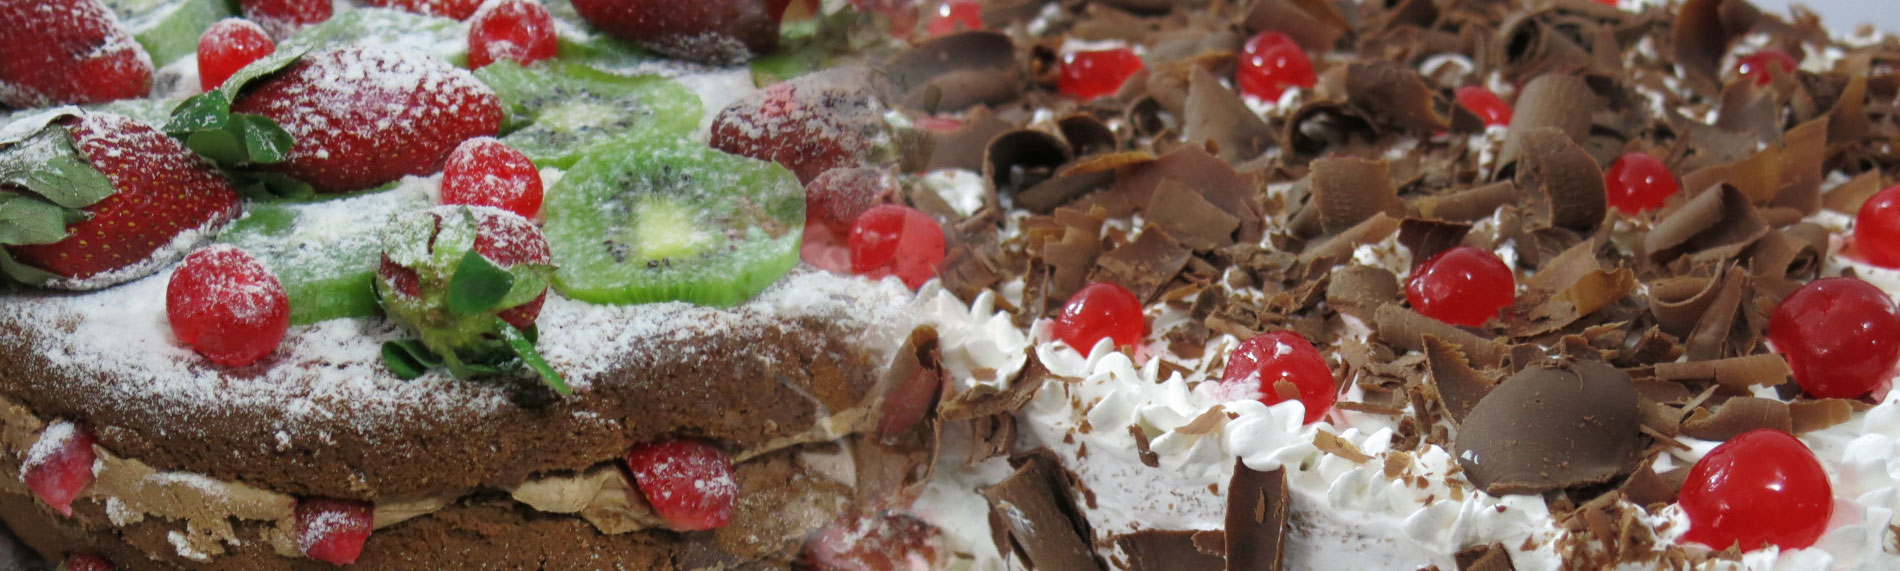 bolos-caseiros-doces-dias